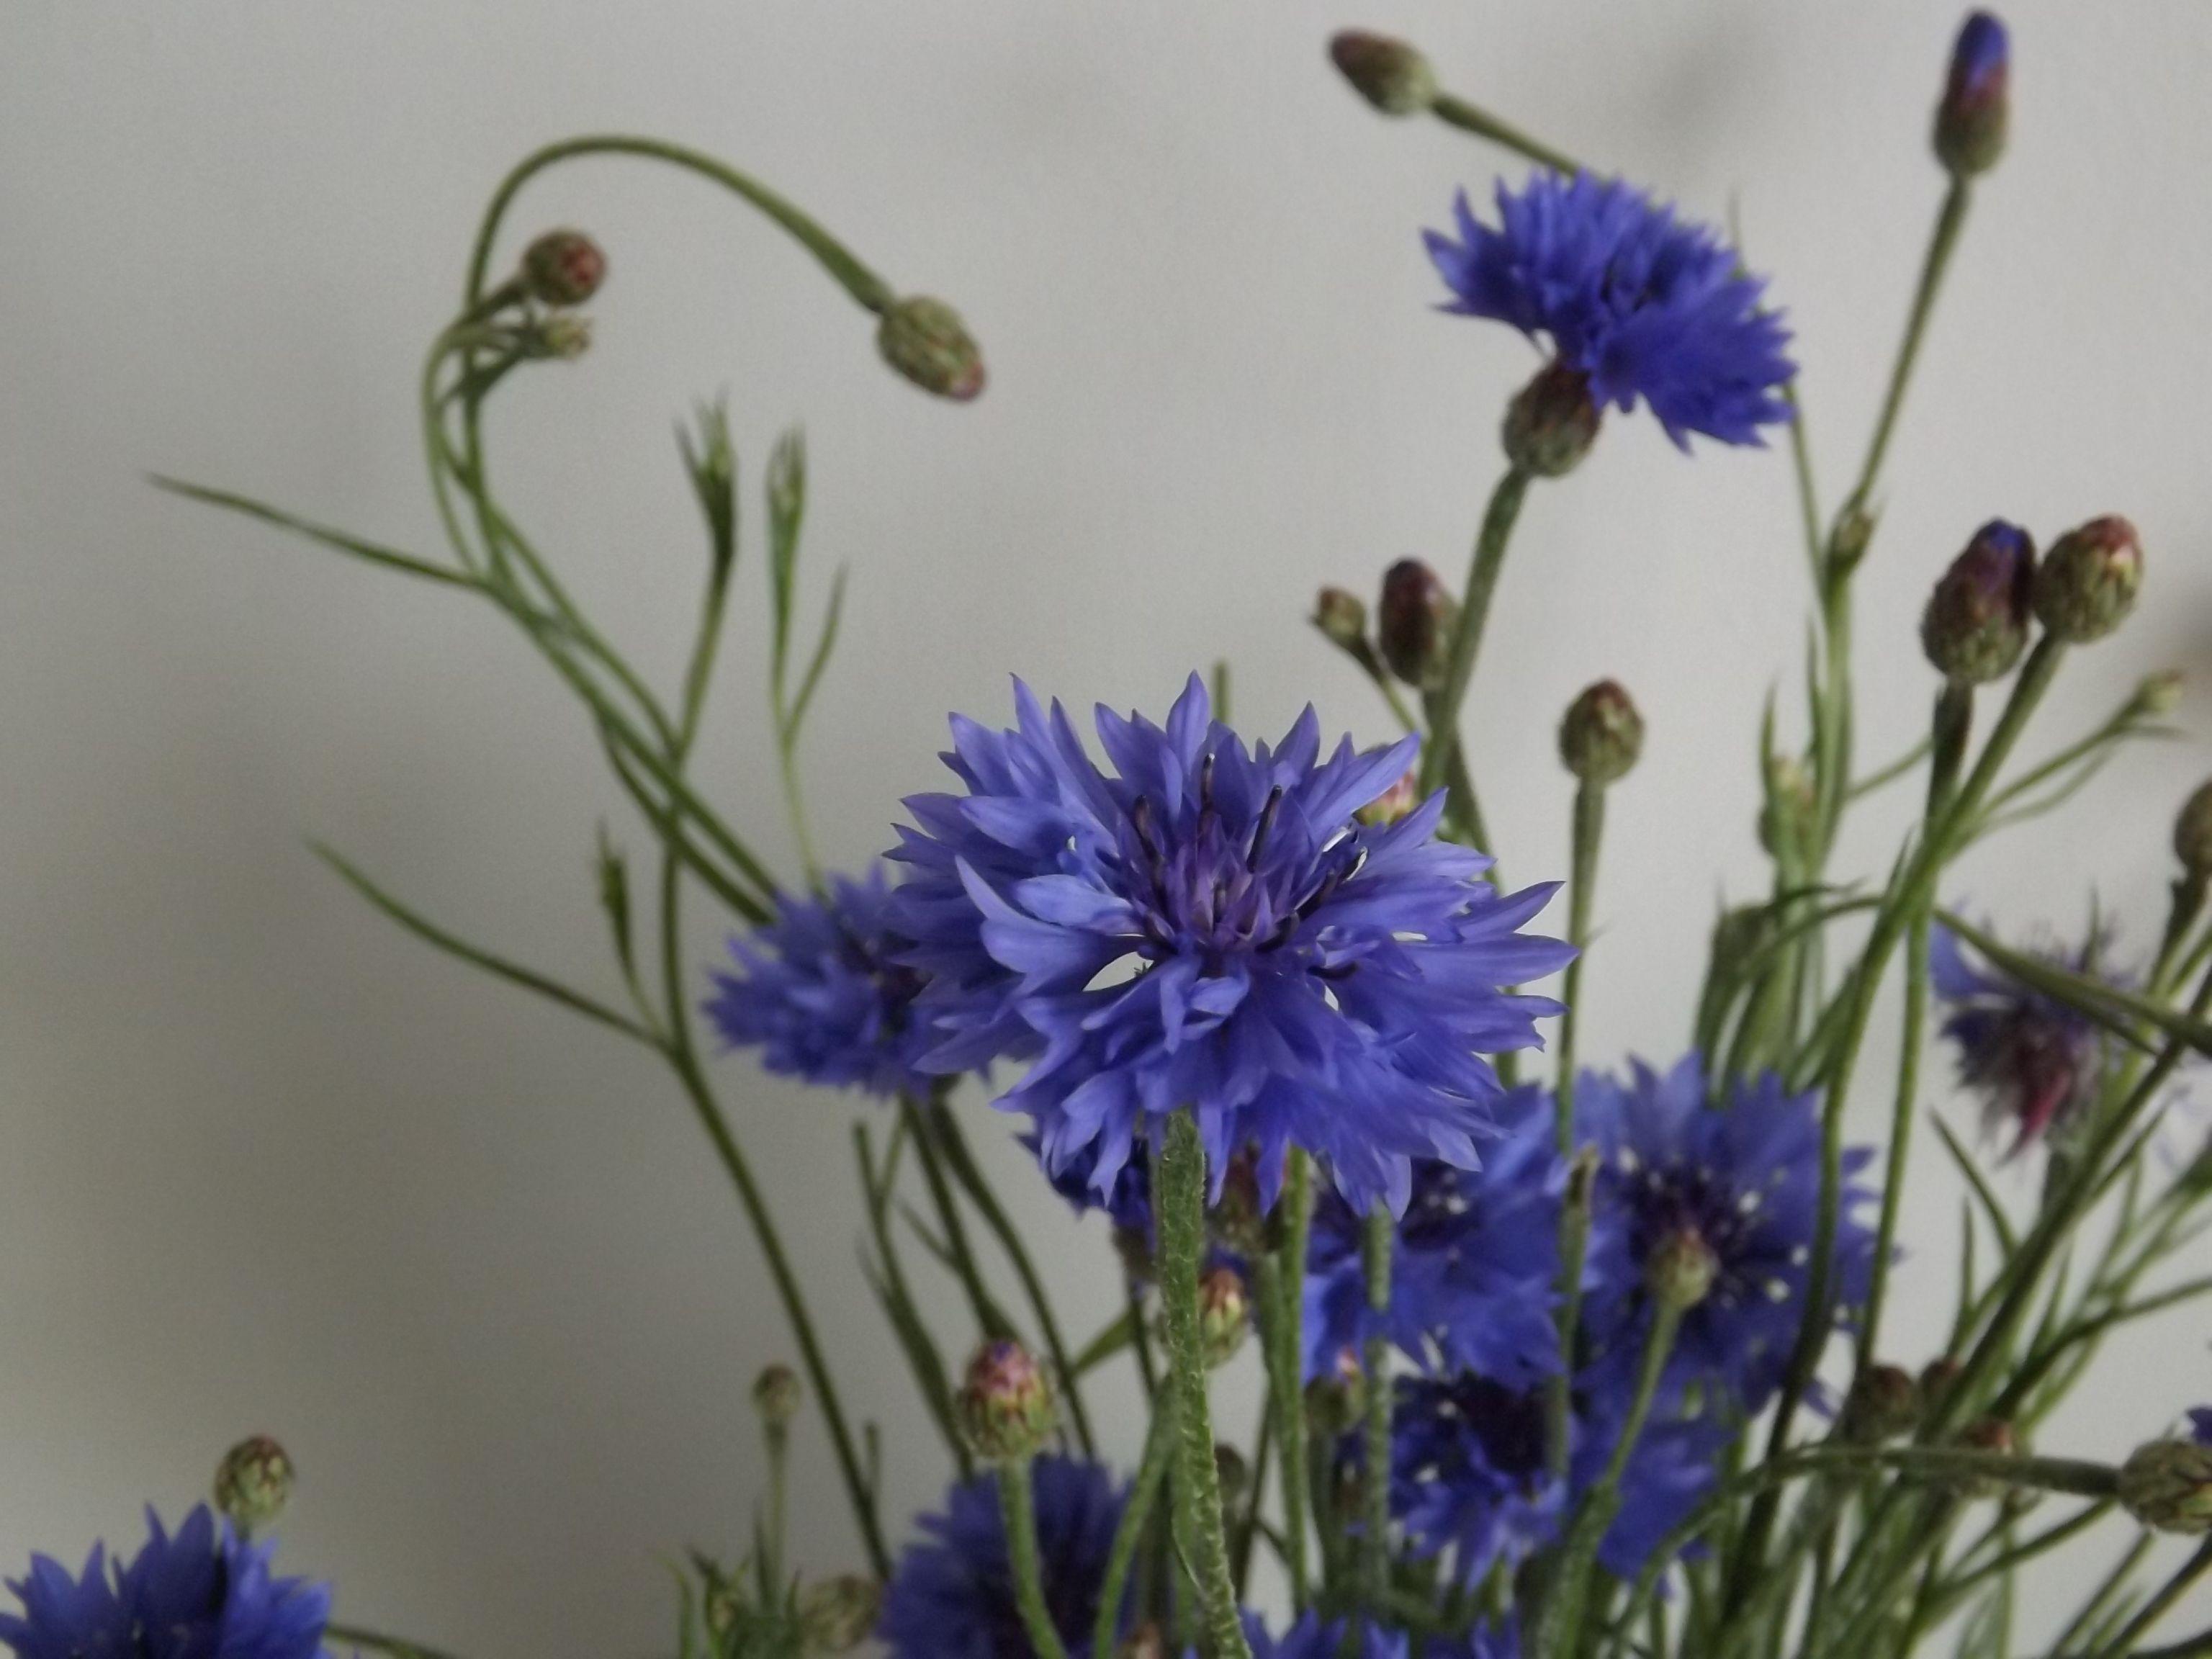 Cornflowers Plant Fungus Trees To Plant Cornflower